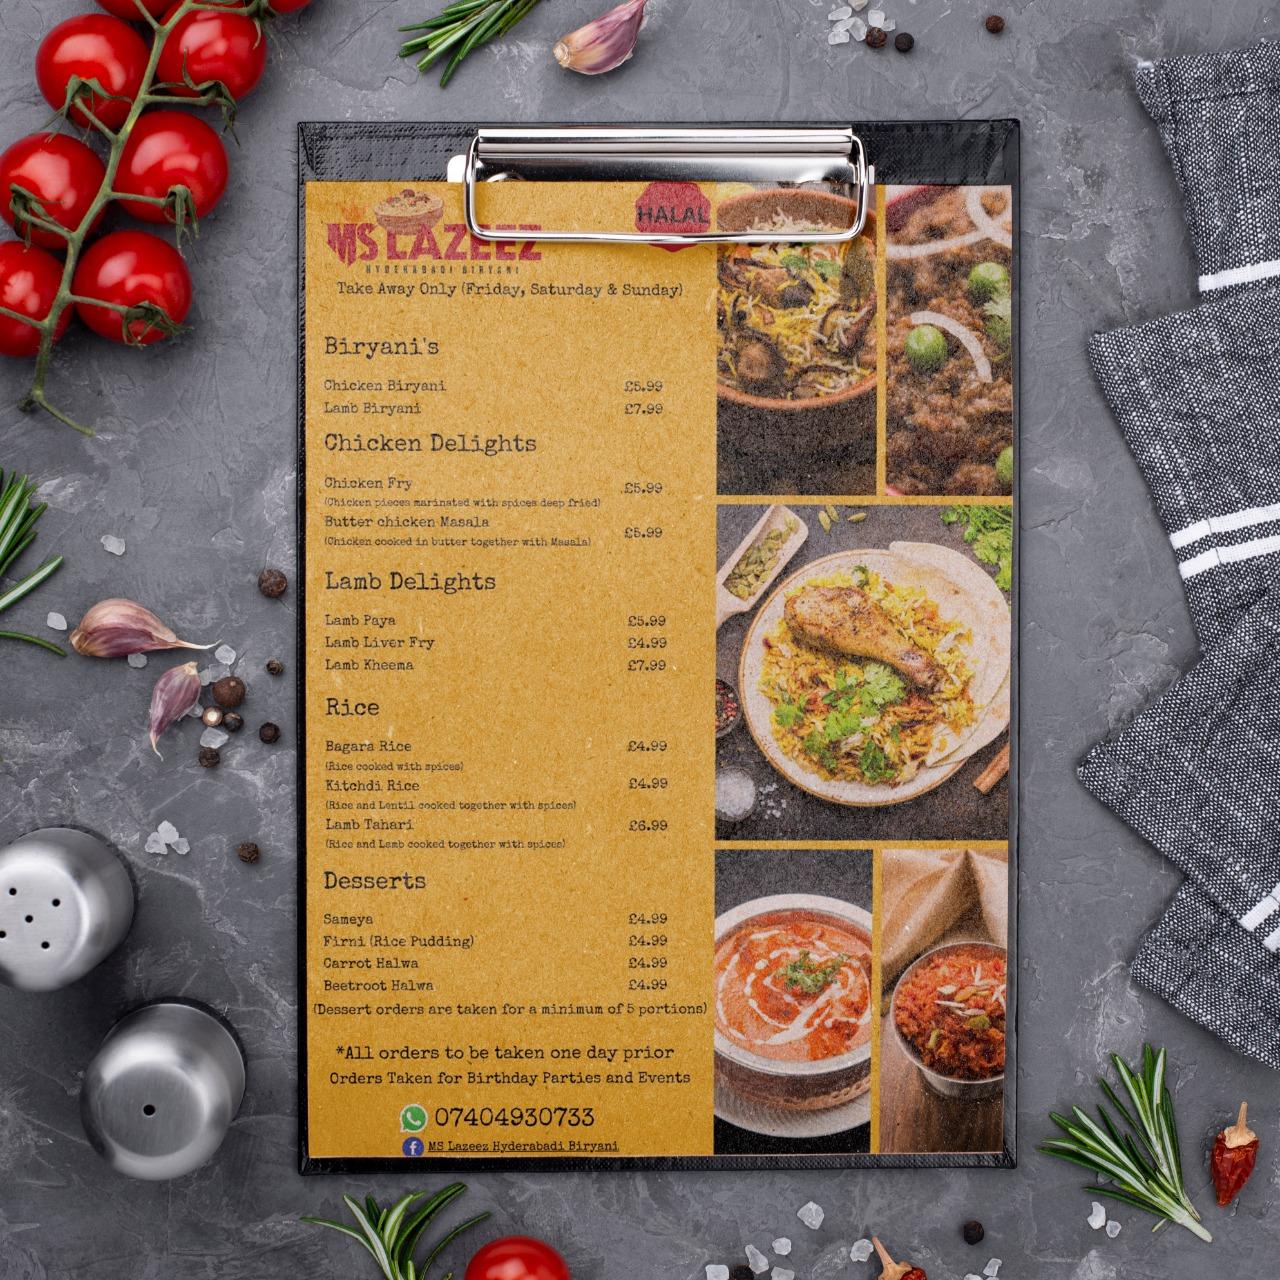 Takeaway Menu Design for MS Lazeez Hyderbadi Biryani in Northampton